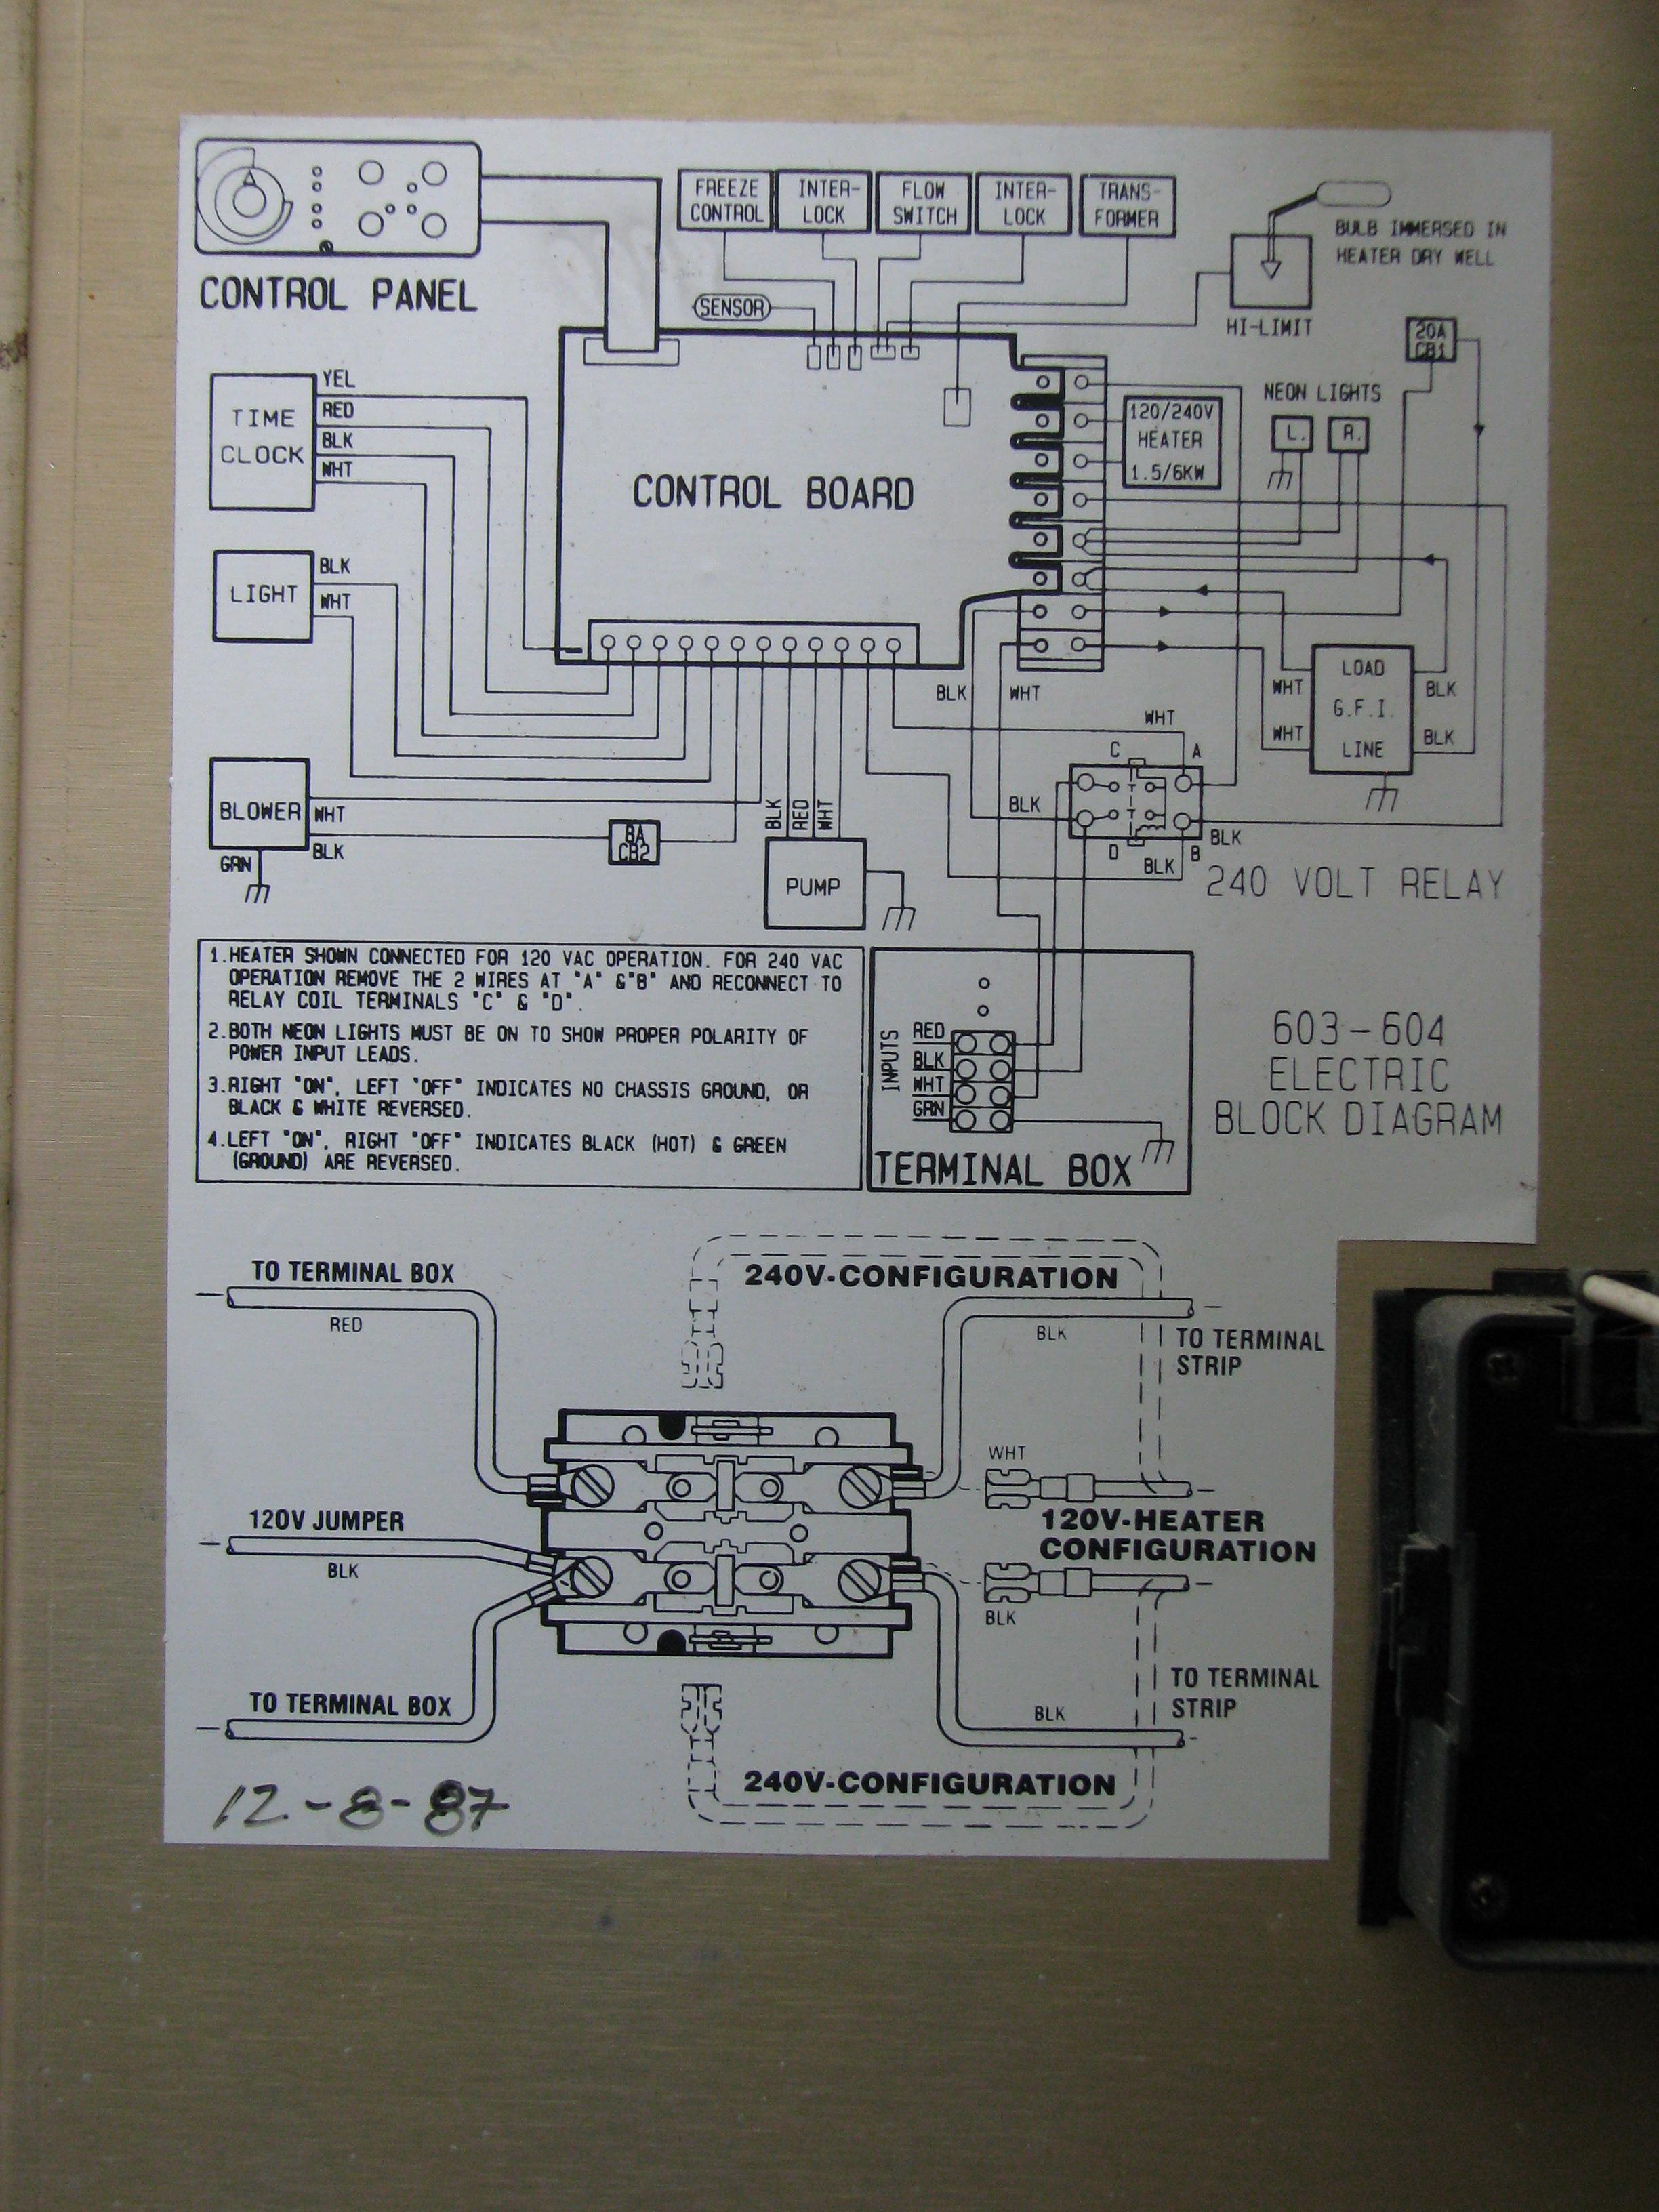 2002 cal spa wiring diagram 1997 ford f250 radio vita duet elsavadorla